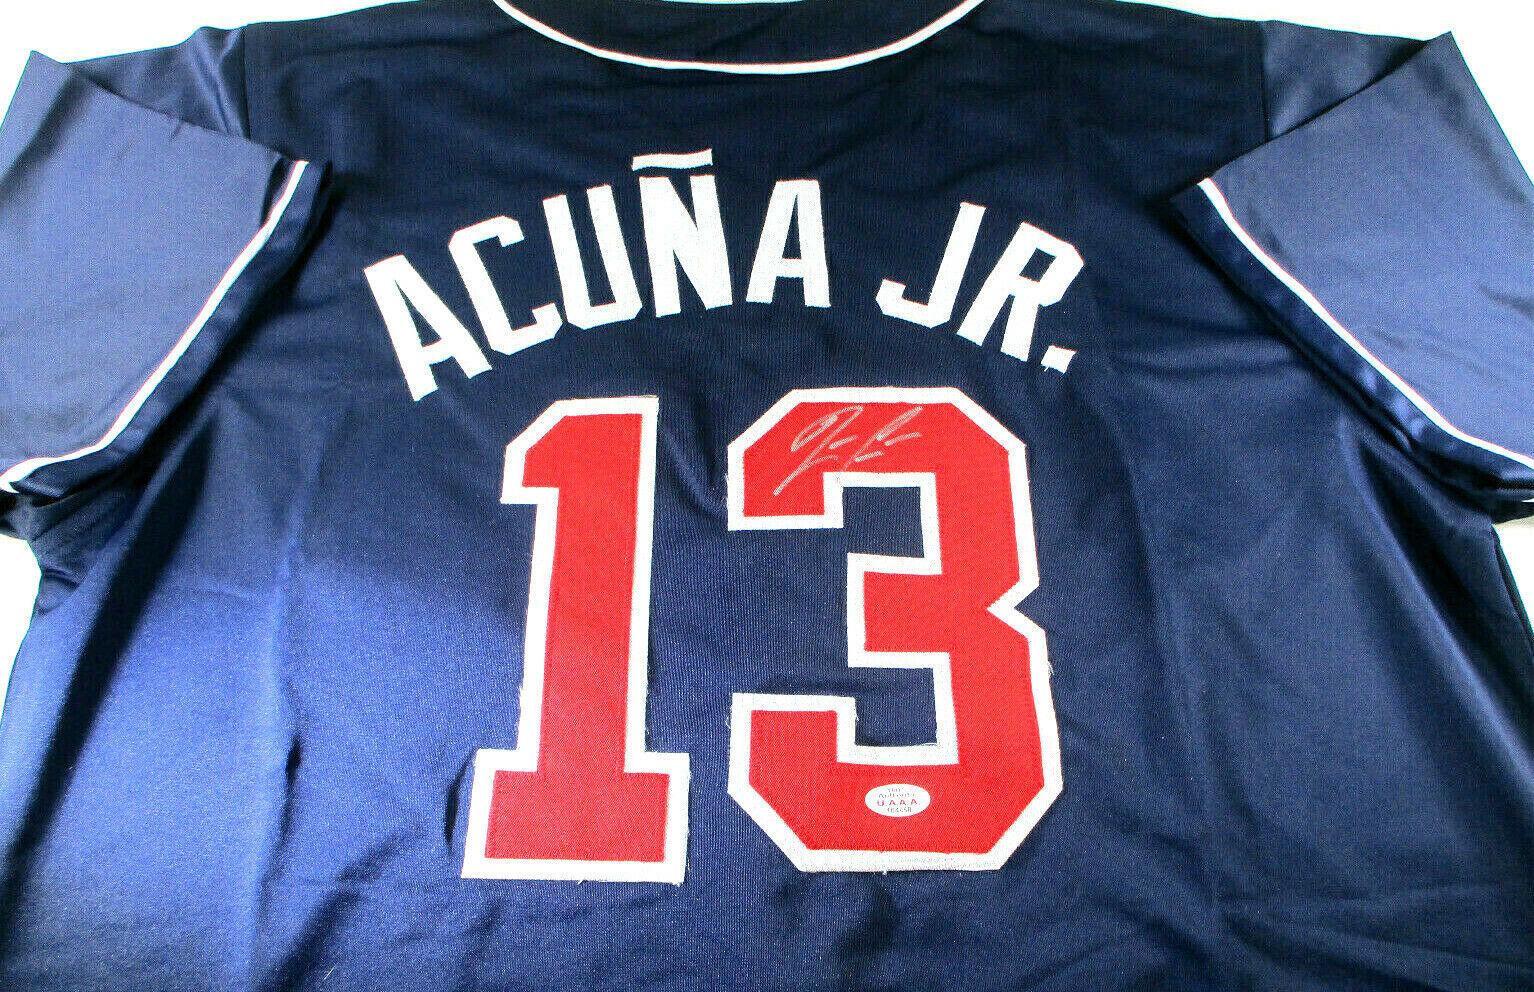 RONALD ACUNA JR / AUTOGRAPHED ATLANTA BRAVES BLUE CUSTOM BASEBALL JERSEY / COA